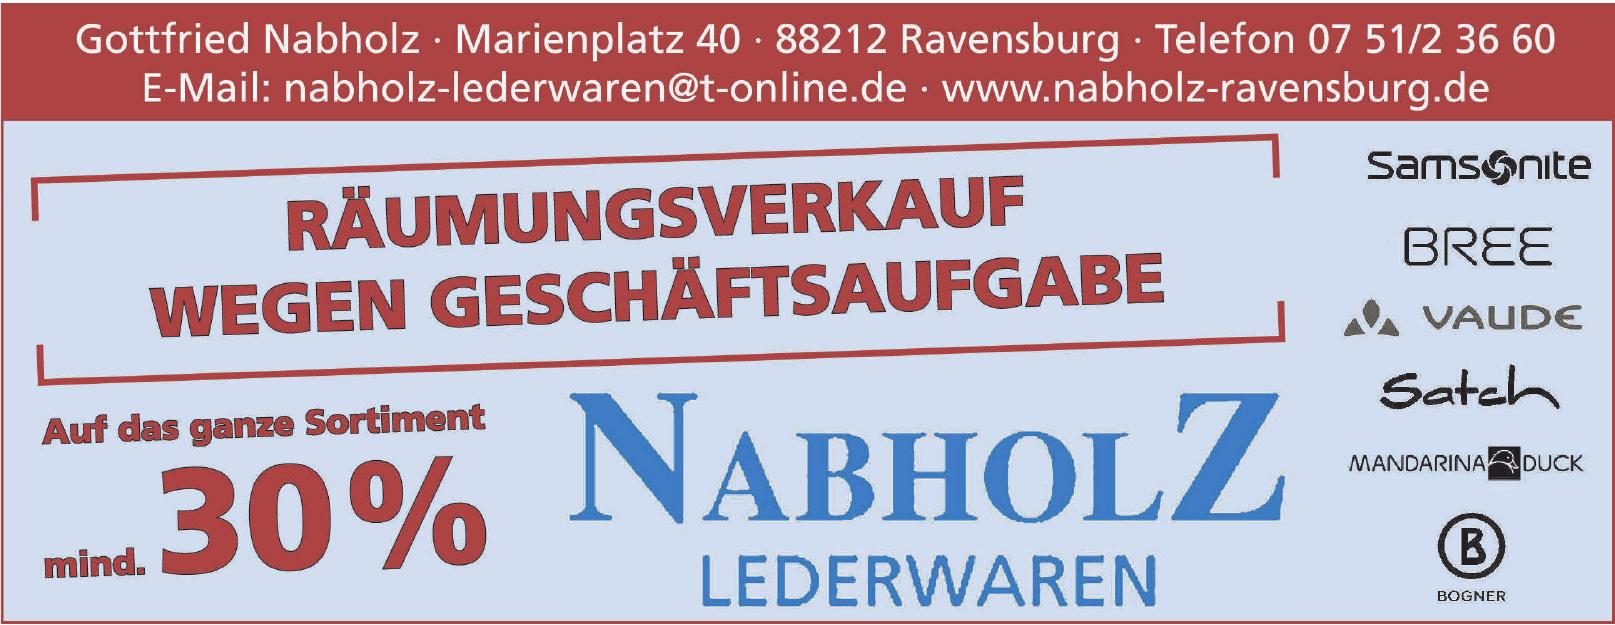 Gottfried Nabholz